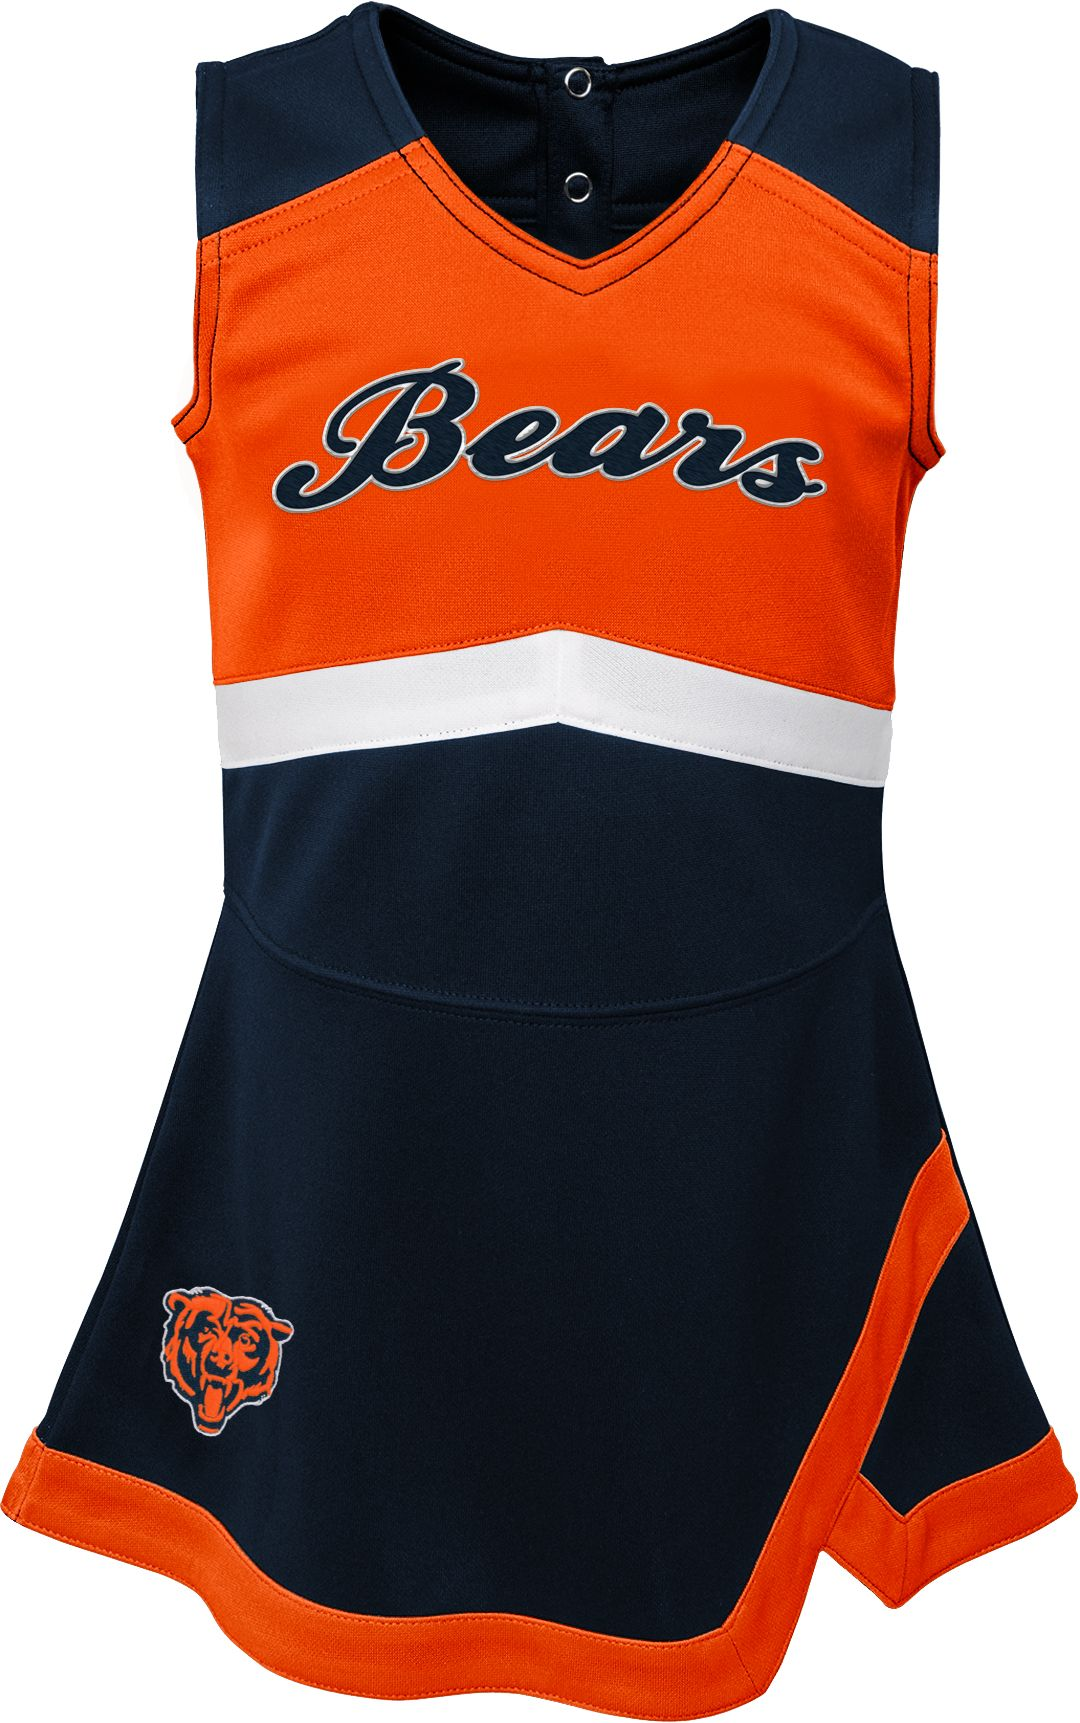 buy popular 632f8 c6d83 NFL Team Apparel Toddler Chicago Bears Cheer Jumper Dress